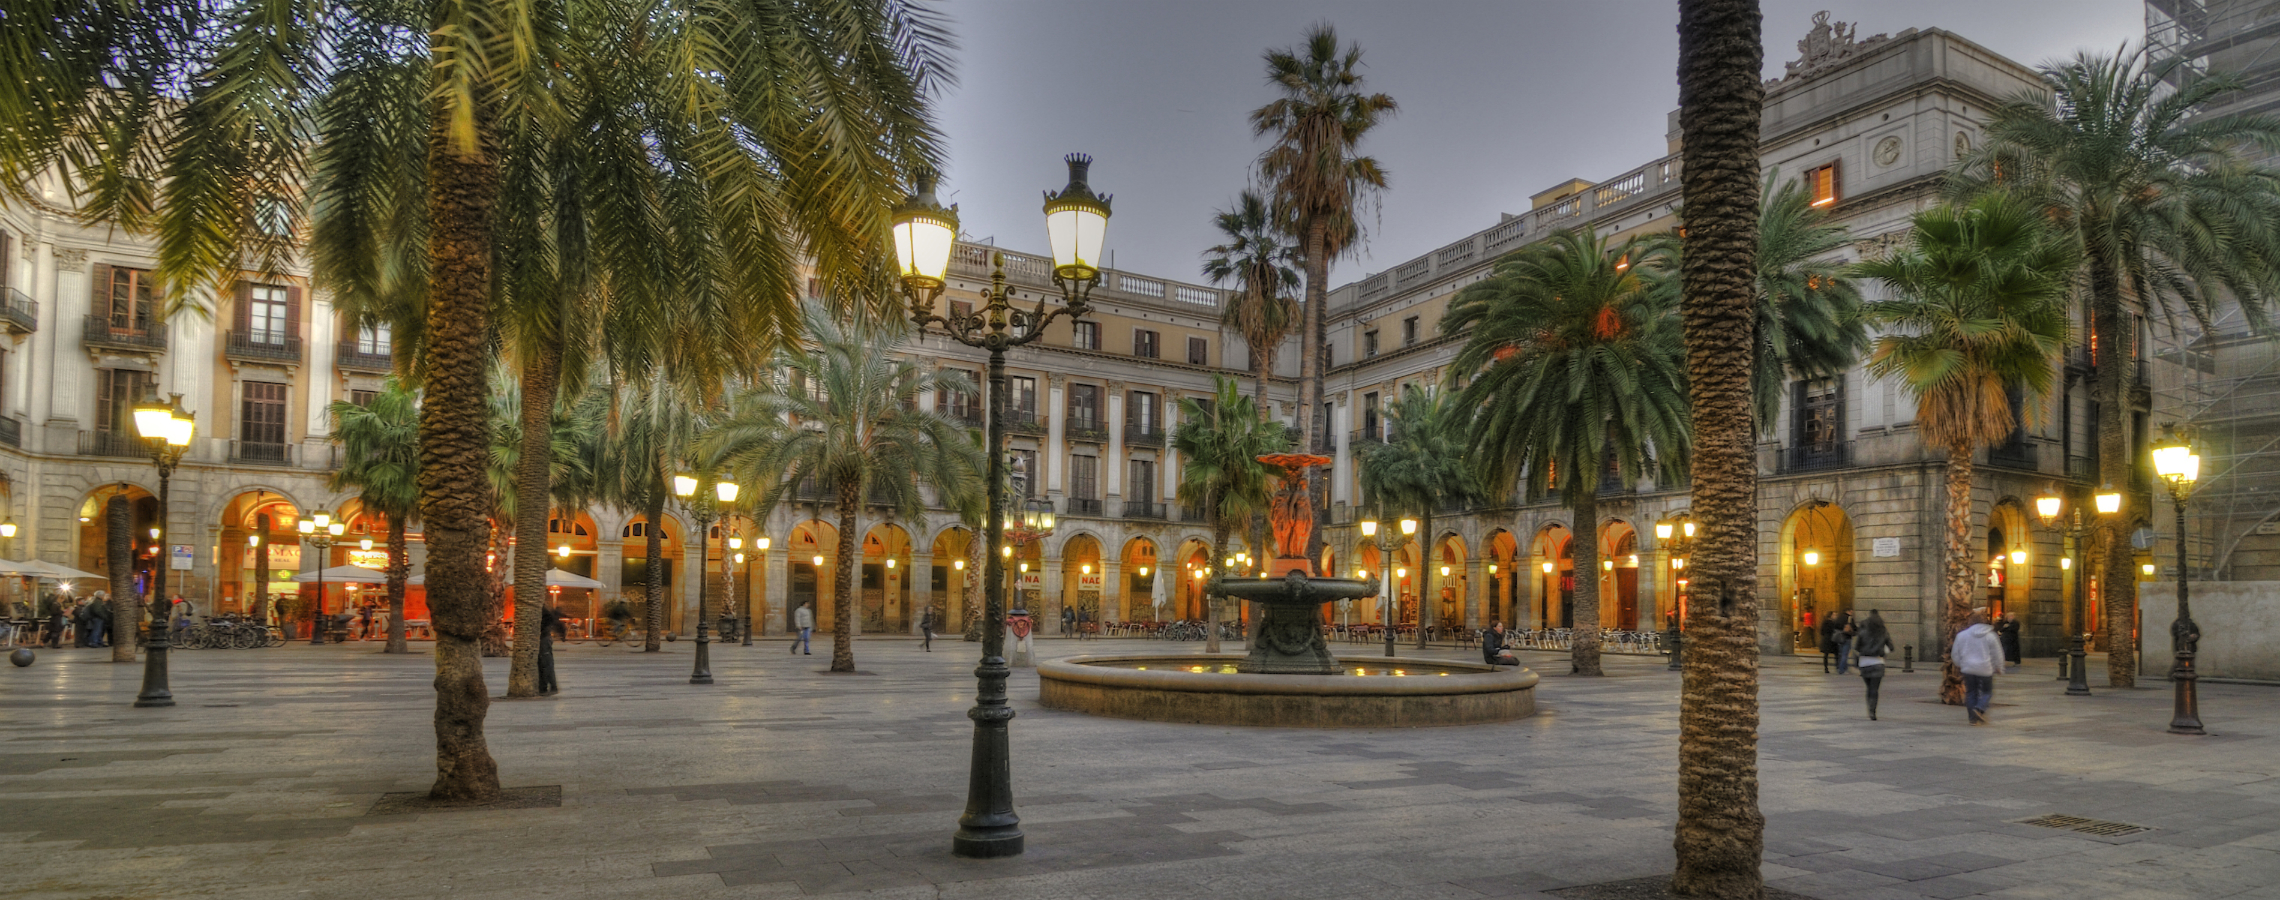 Das Stadtviertel Ciutat Vella